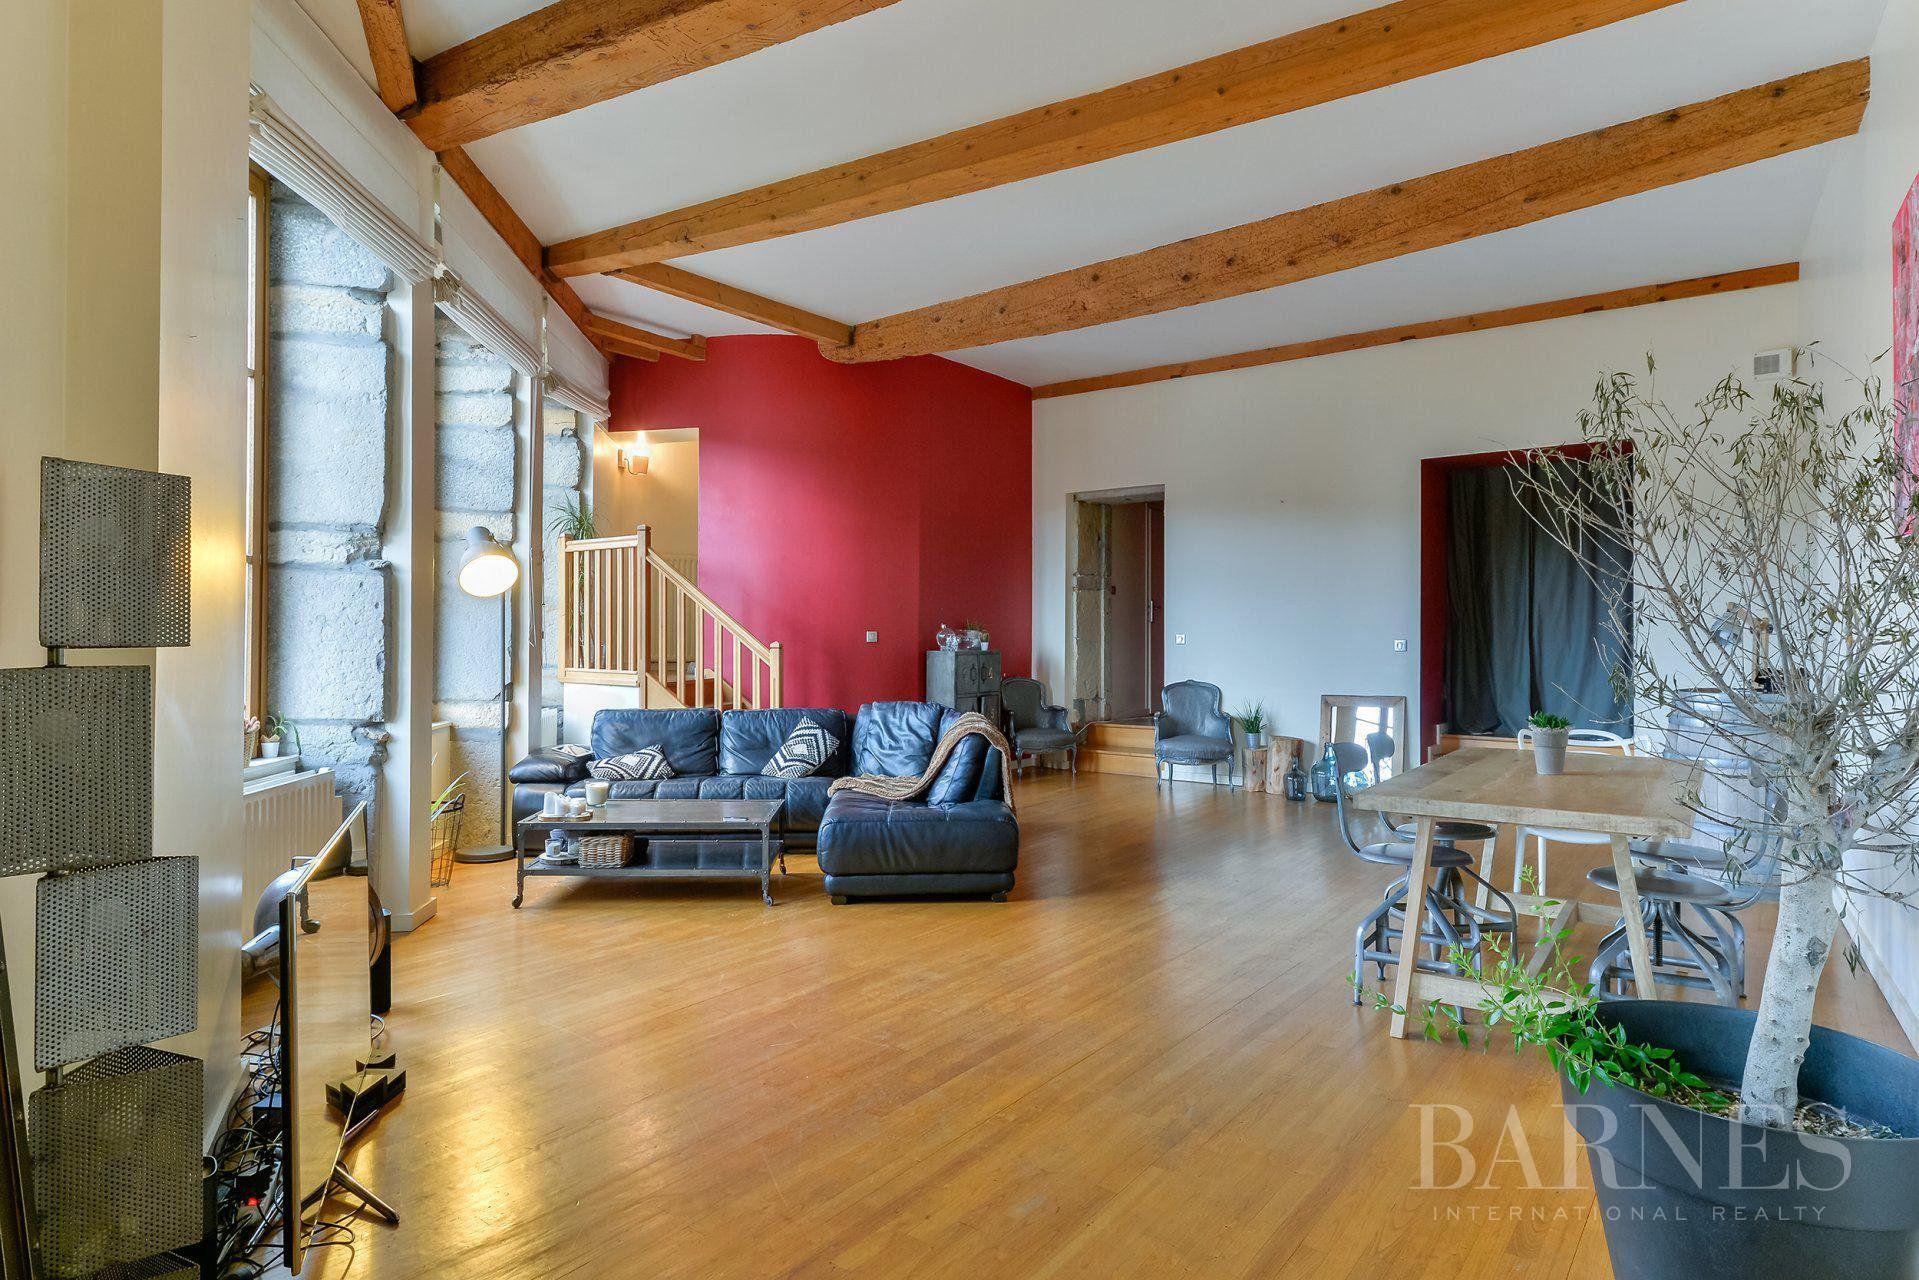 Caluire-et-Cuire - Apartment of 170 sqm in a castle - 3 bedrooms